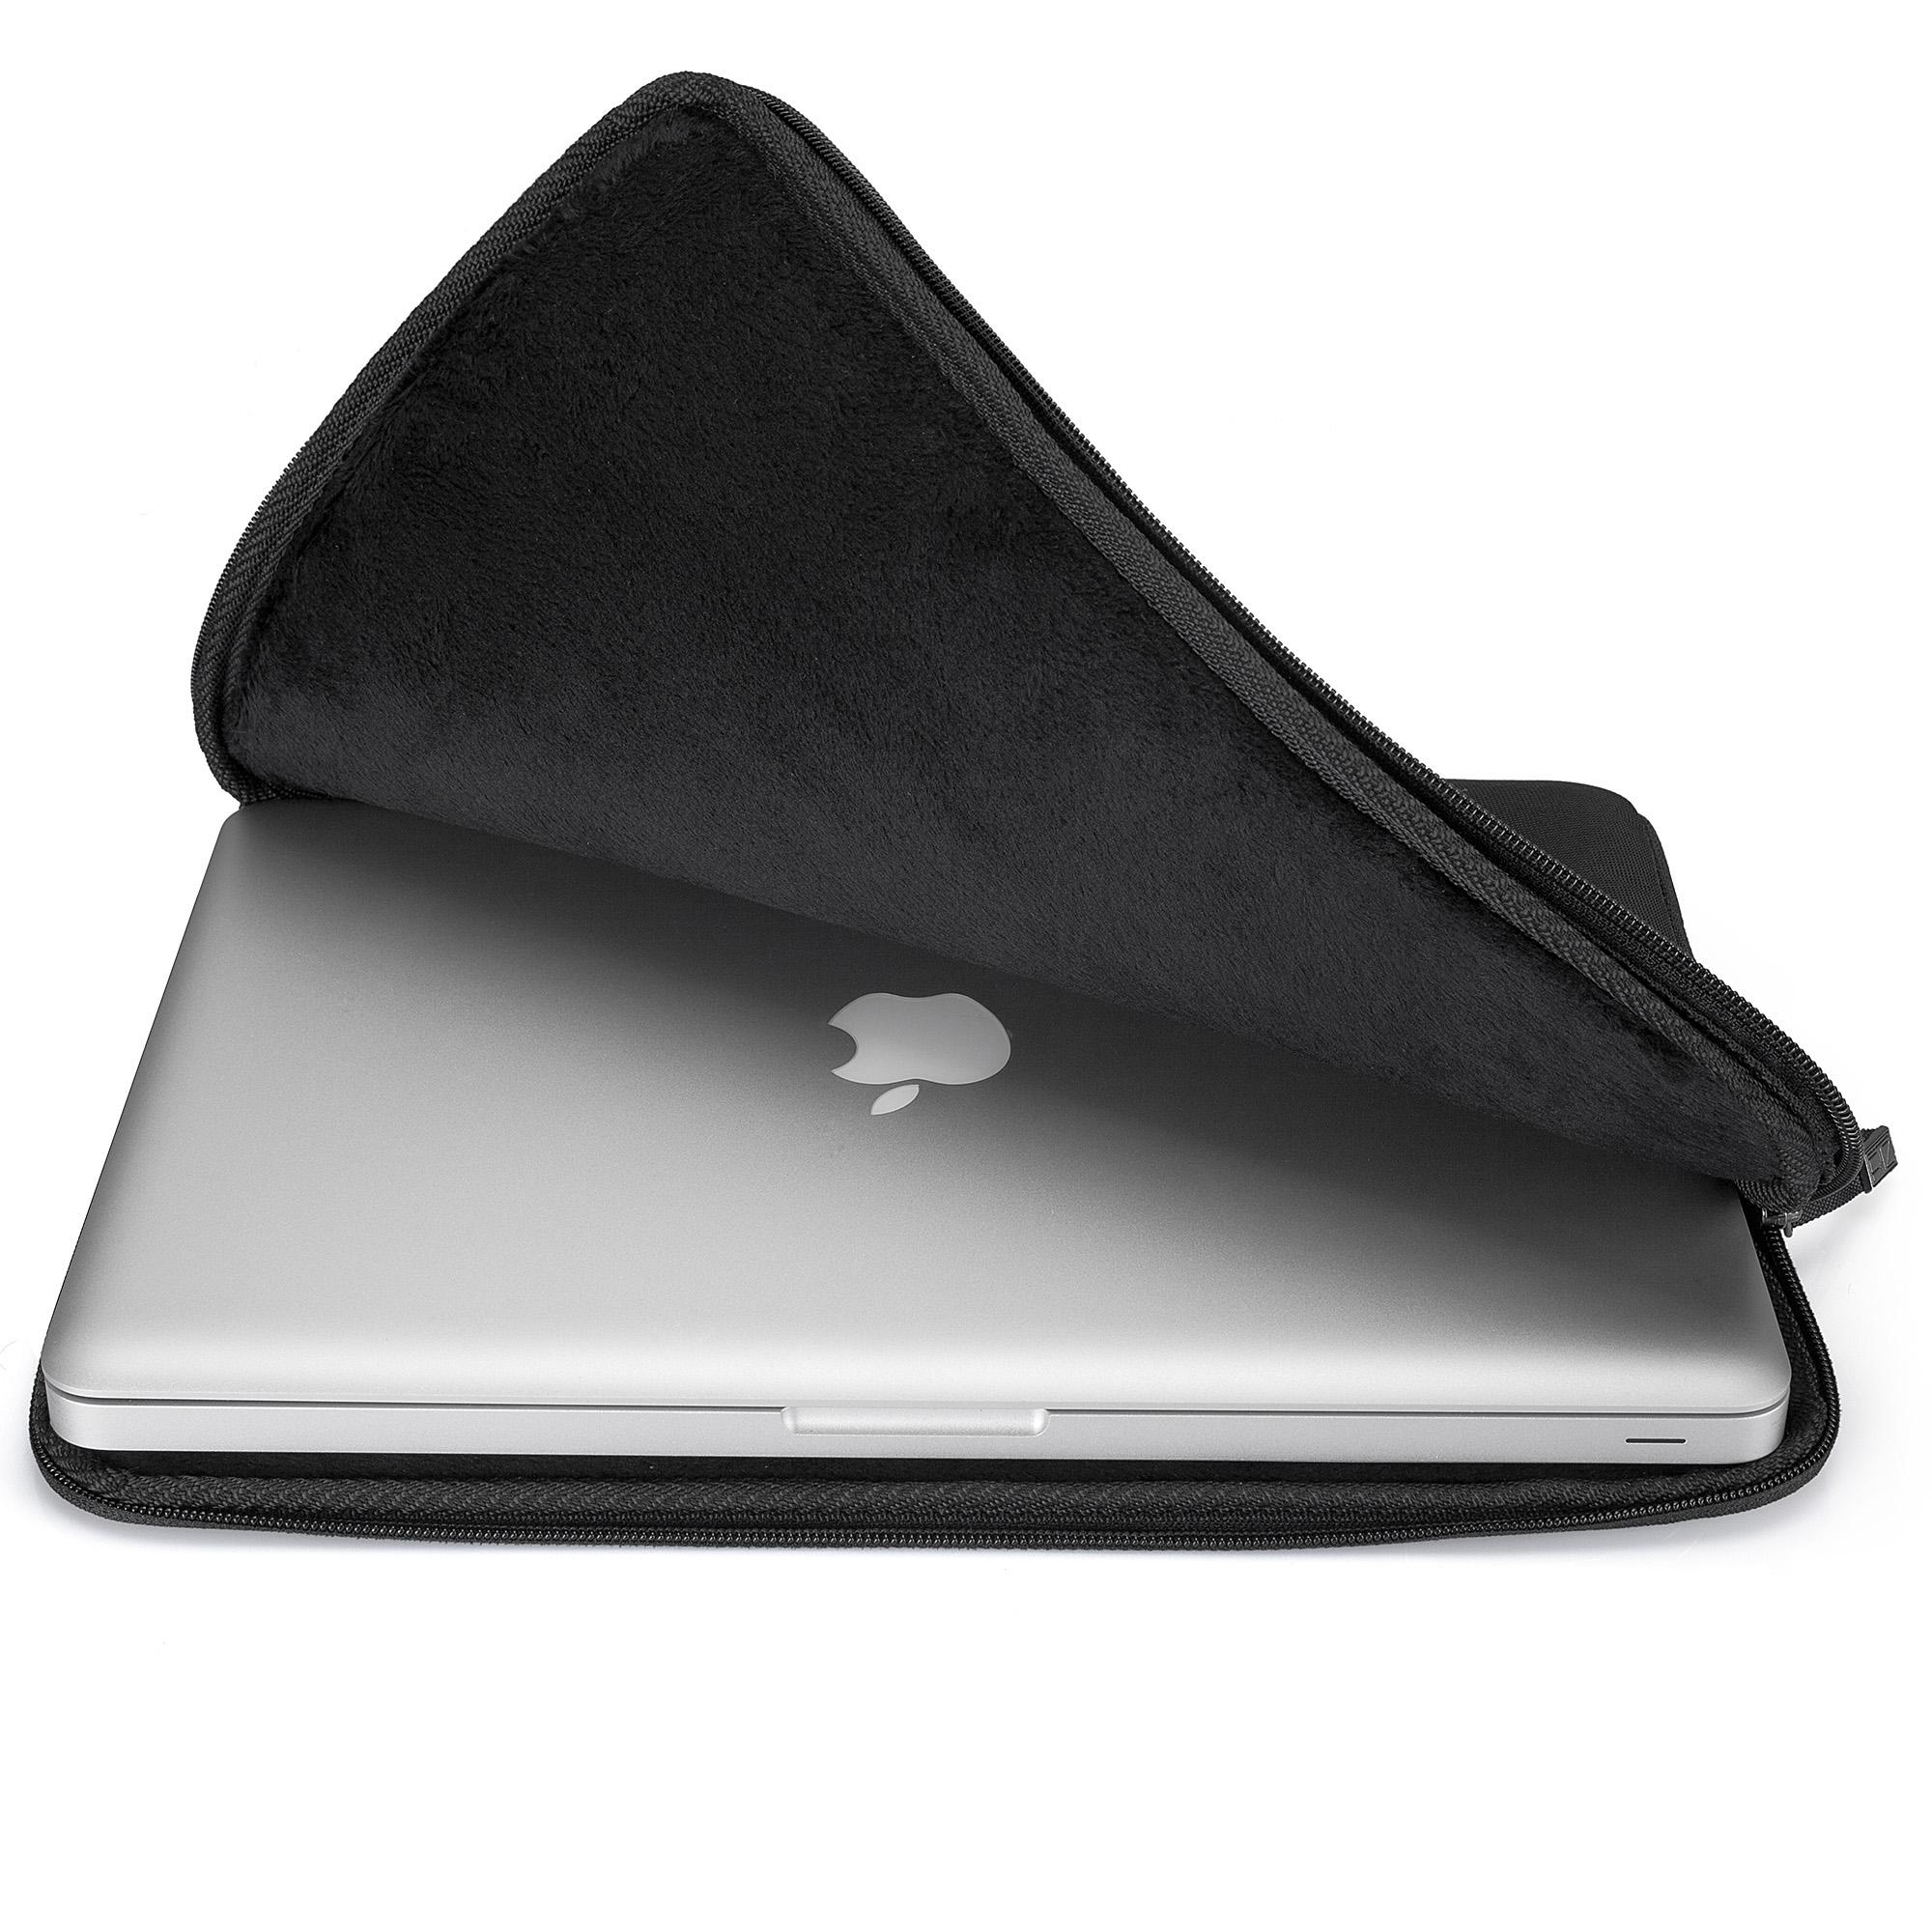 soft sleeve for macbook 11 12 13 15 inch retina pro air laptop case 13 3 15 4 ebay. Black Bedroom Furniture Sets. Home Design Ideas